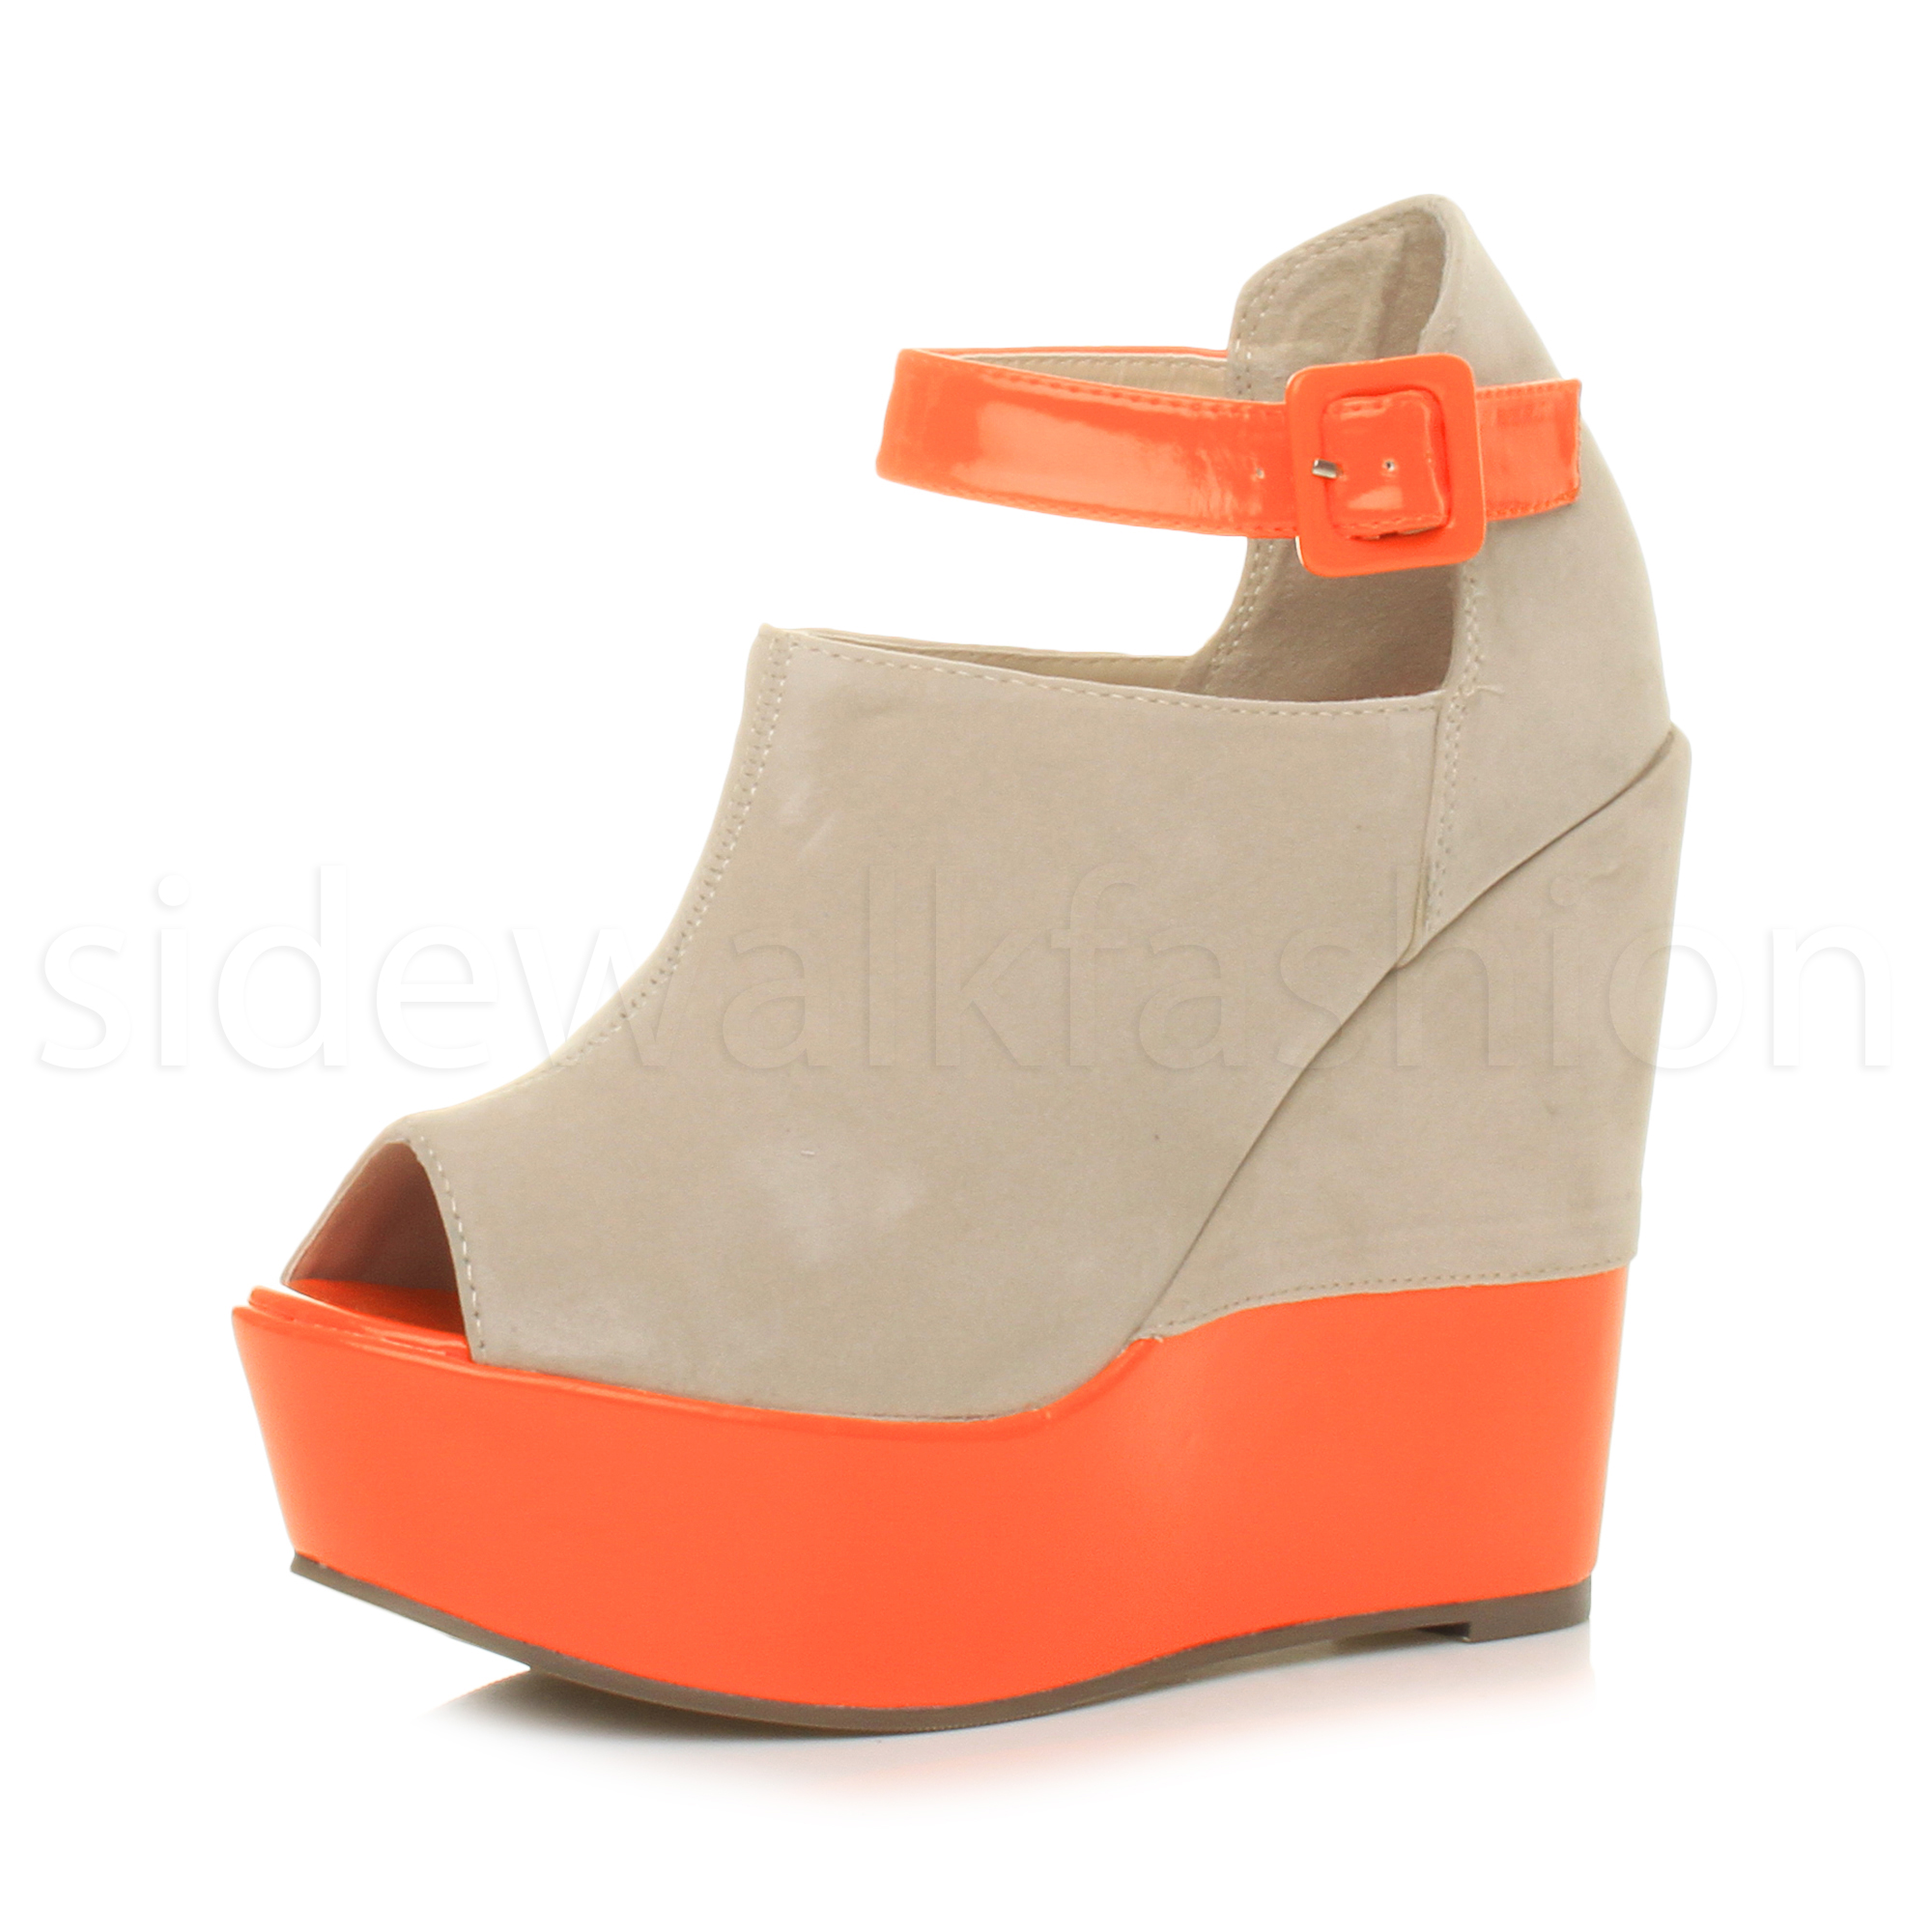 35c82a42bda Womens ladies high wedge heel buckle neon contrast peep toe platform ...